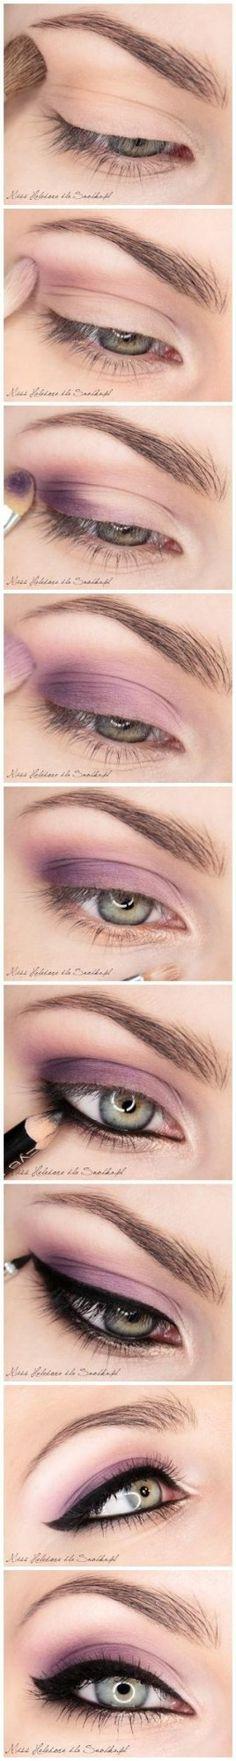 image of Purple Smokey Eye Makeup Tutorial ? Best Bridal Makeup (Best Eyeliner For Tightlining) Purple Smokey Eye, Purple Eyeshadow, Smokey Eye Makeup, Skin Makeup, Purple Makeup, Smoky Eye, Eyeshadow Makeup, Makeup Contouring, Eyeshadow Ideas